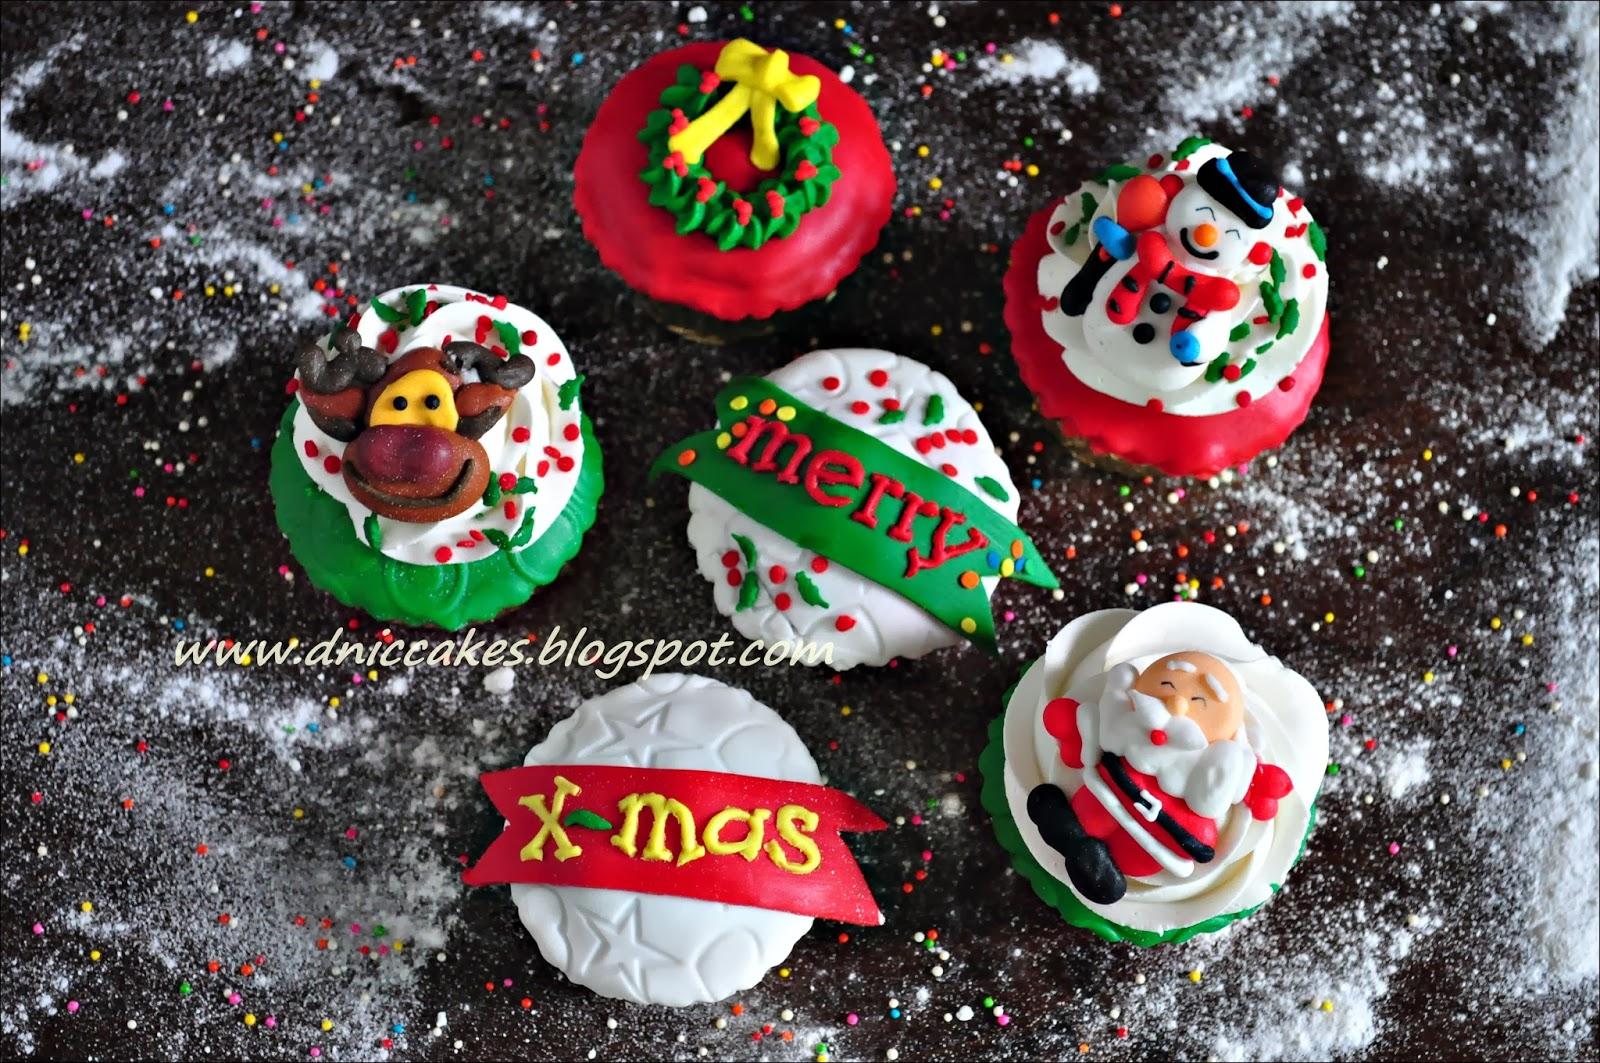 D Nic Cakes 2013